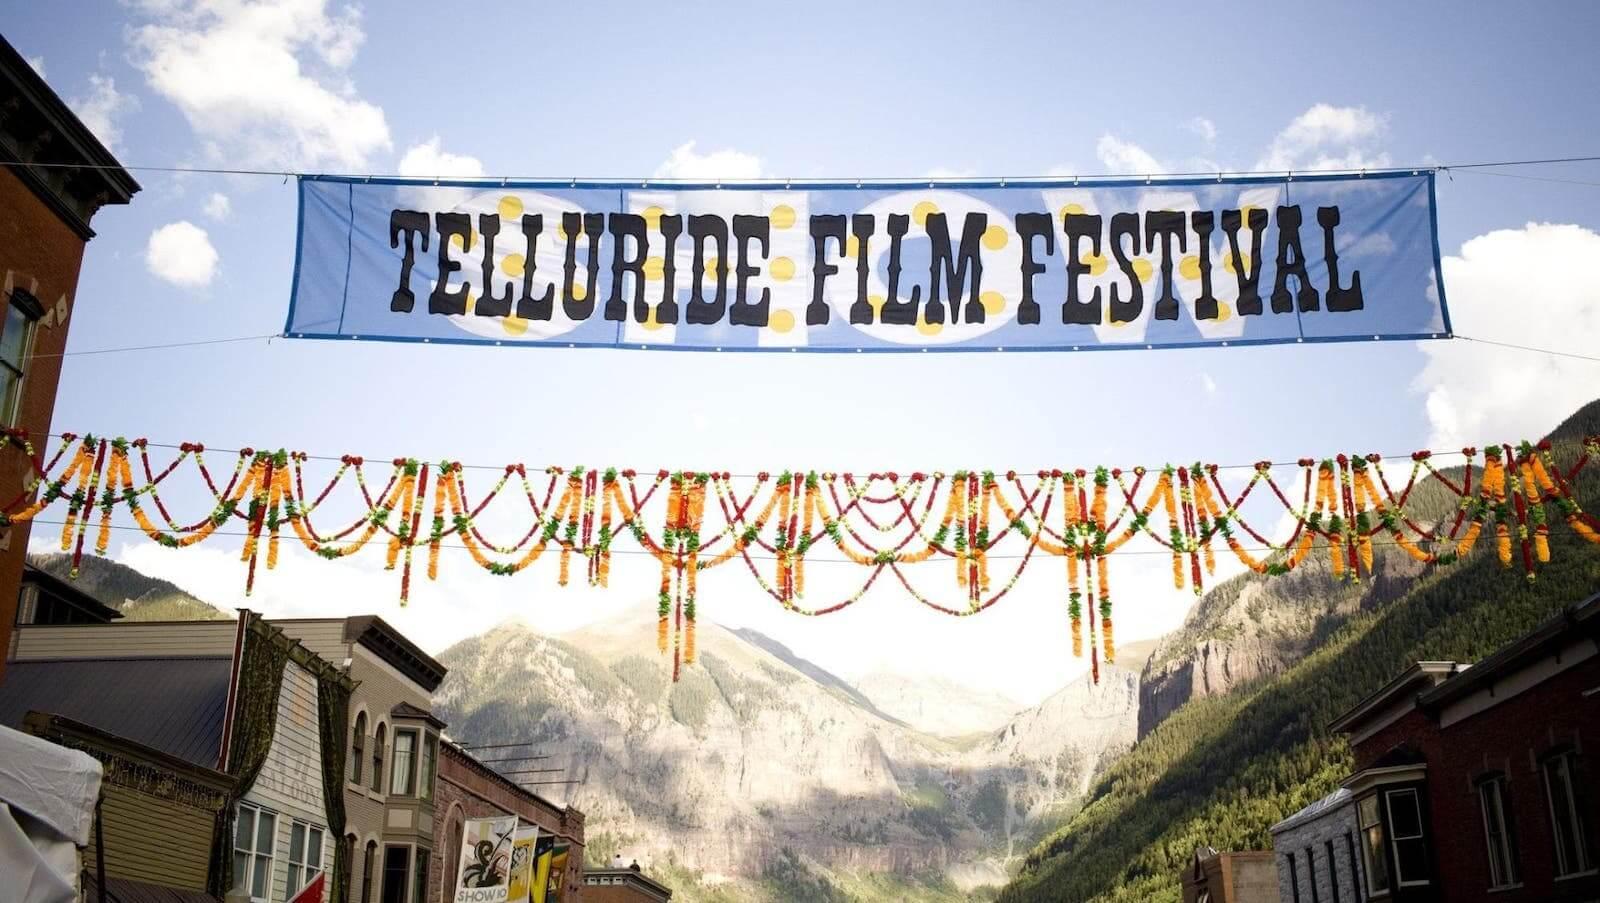 Telluride Film Festival - Colorado MOuntins Hideaway - StudioBinder